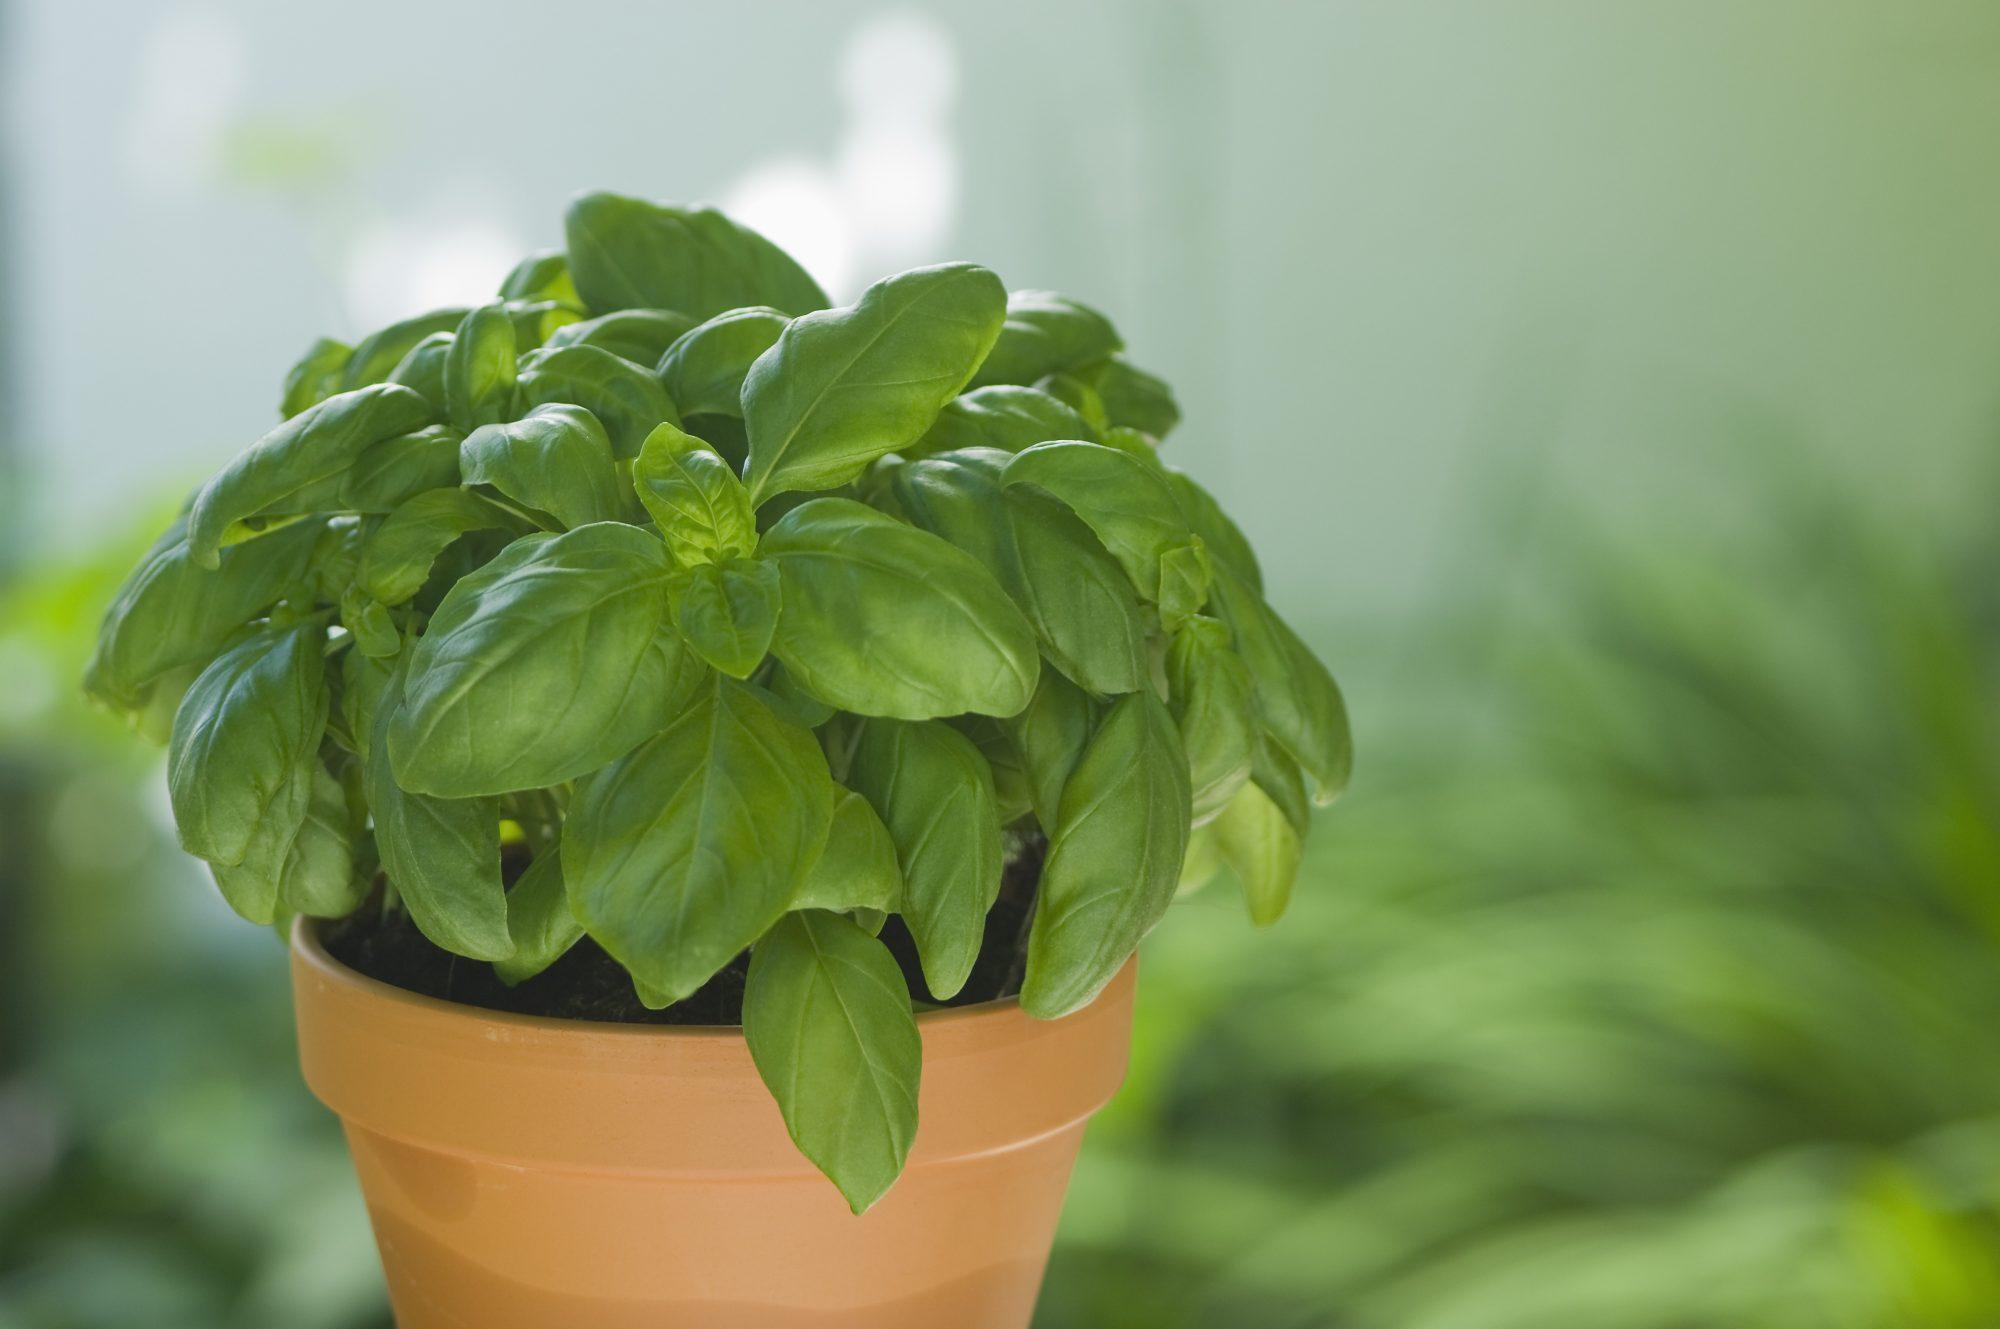 Basil in pot Getty 4/24/20